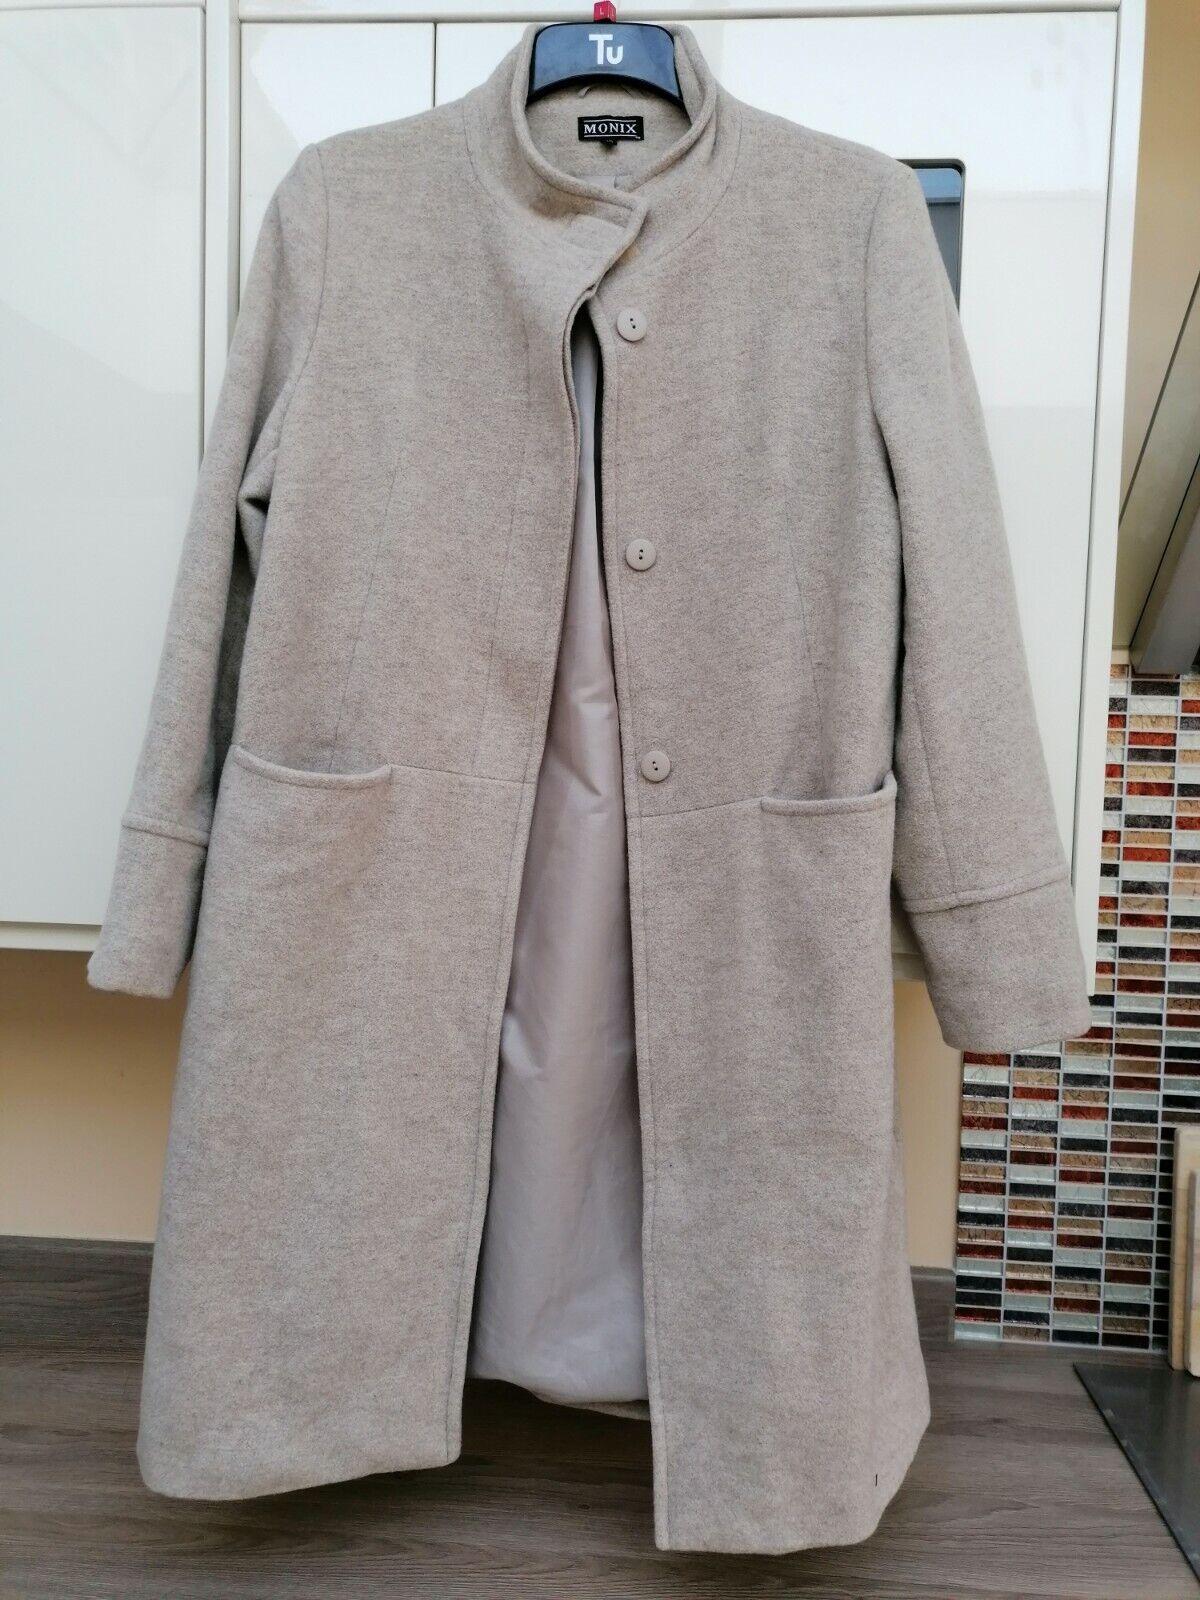 Beige Smart Monix Wool Mix Coat 14/16 see measurements